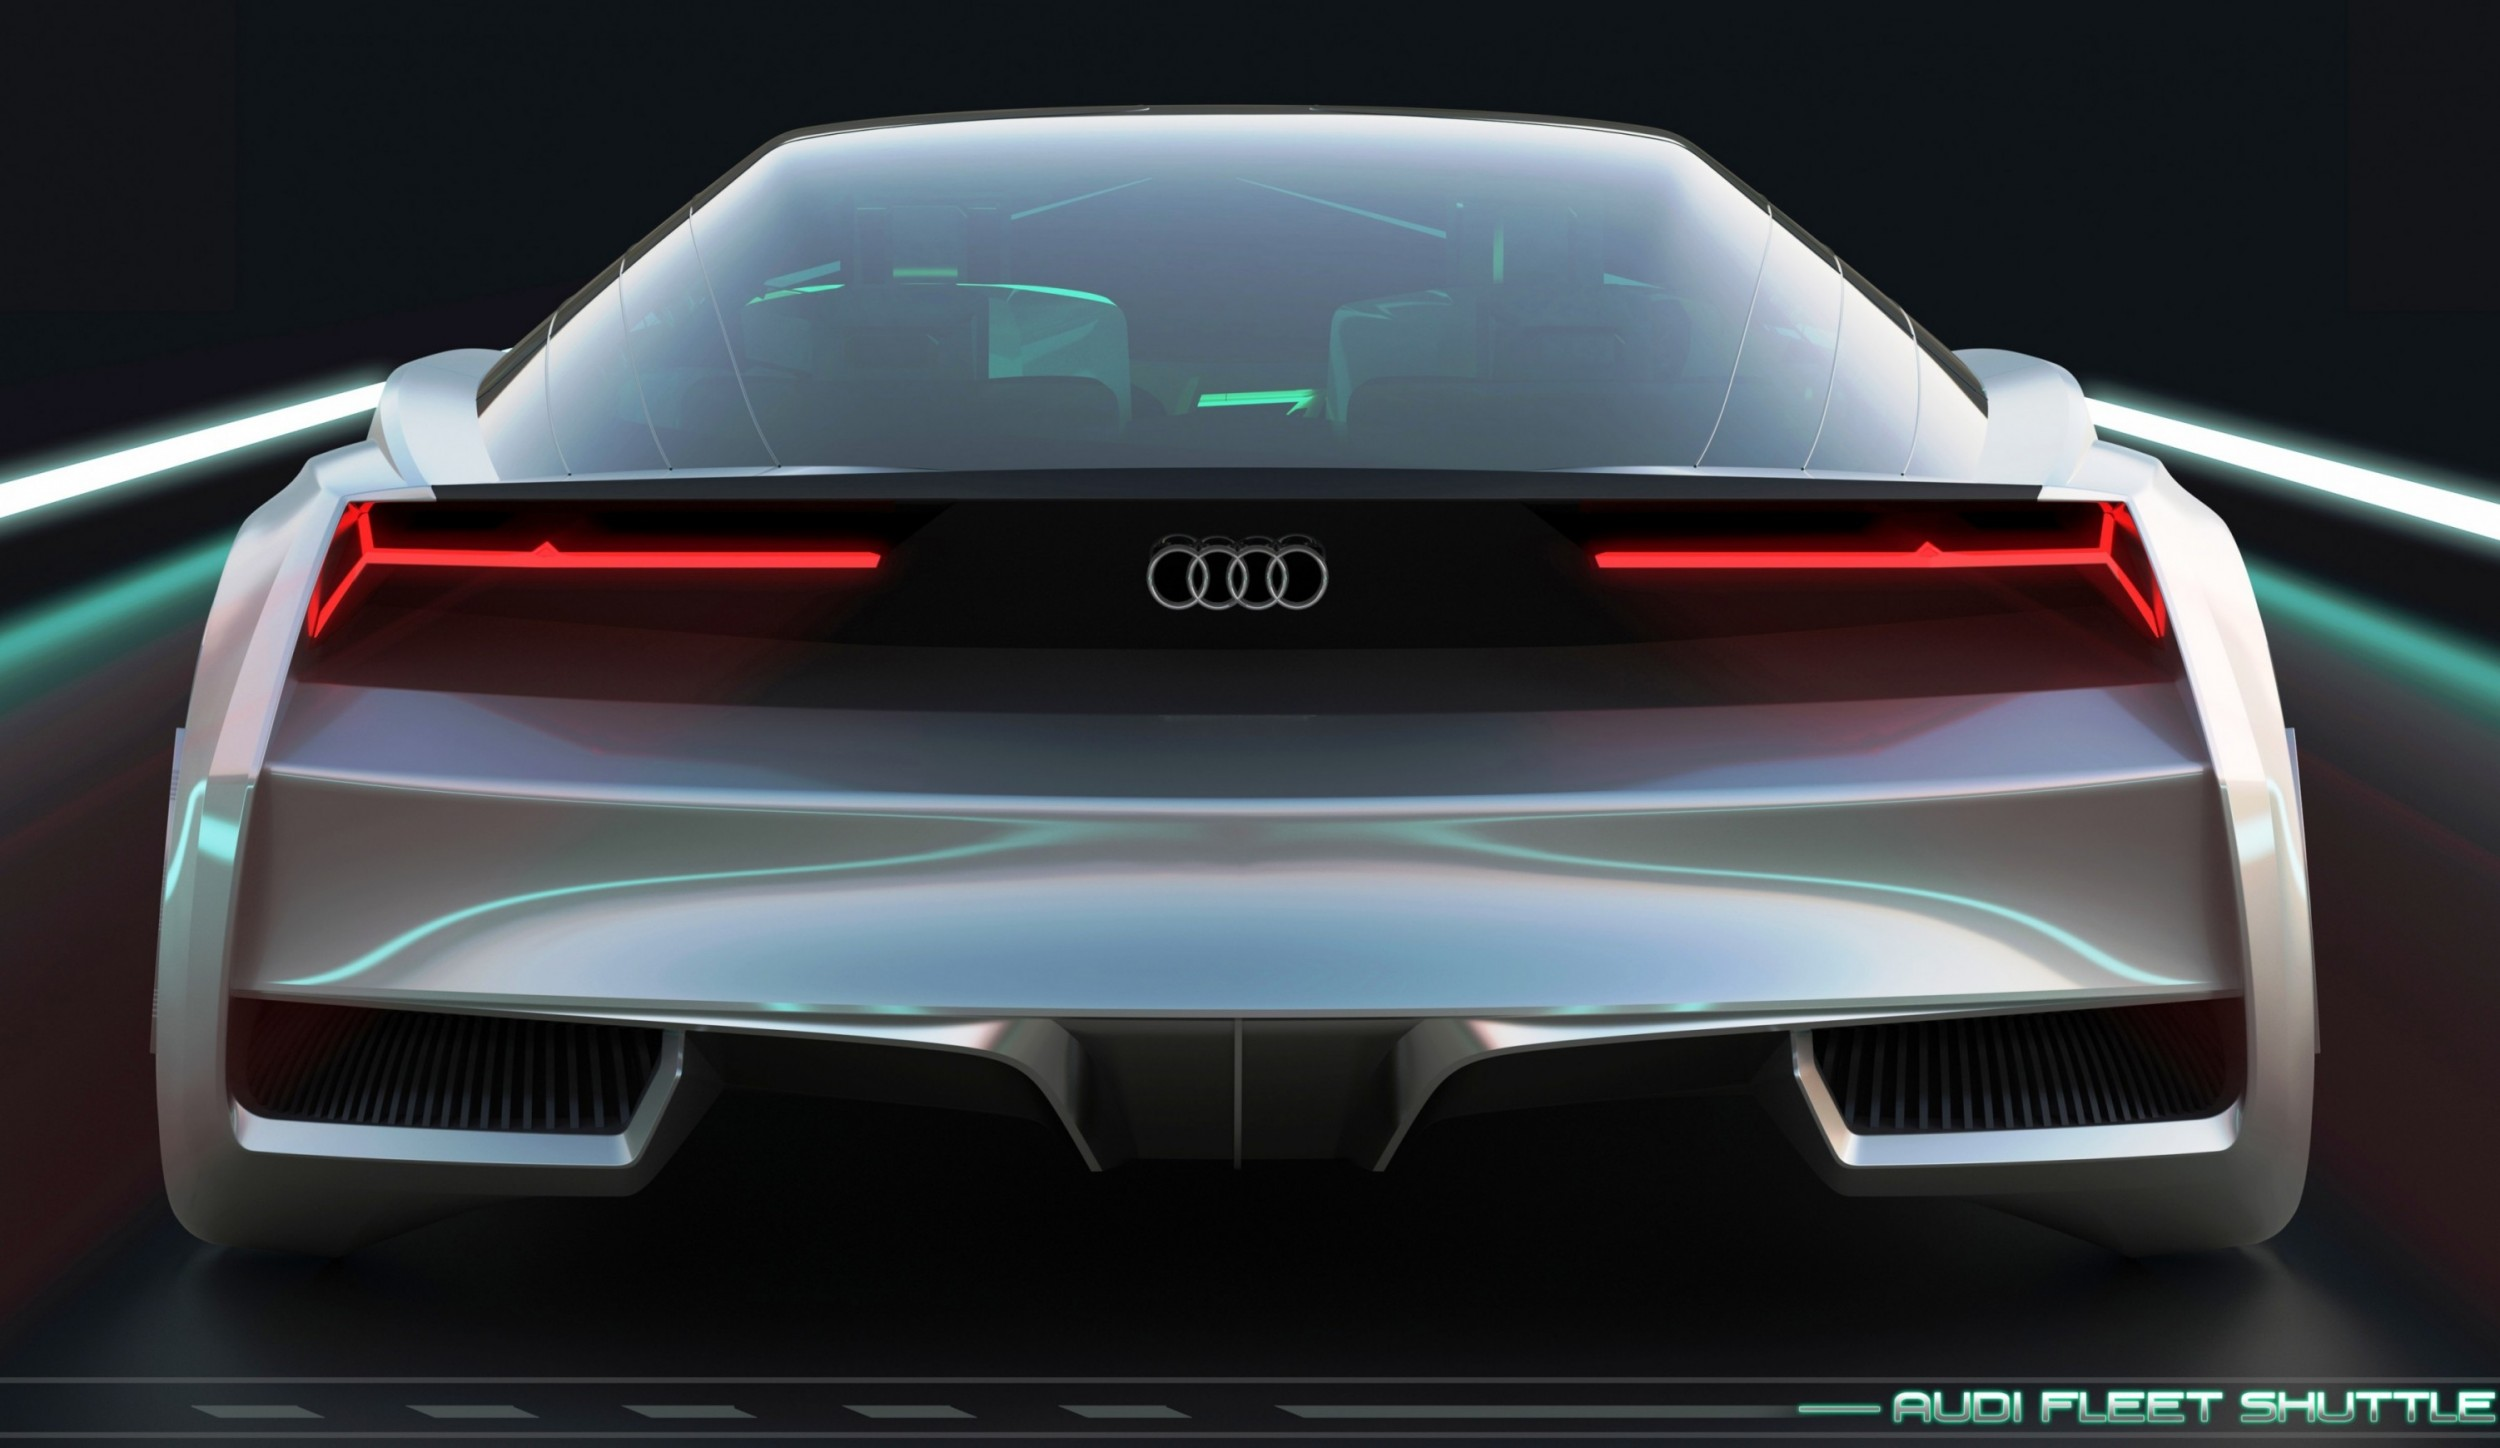 Concept Flashback 2013 Audi Fleet Shuttle Quattro